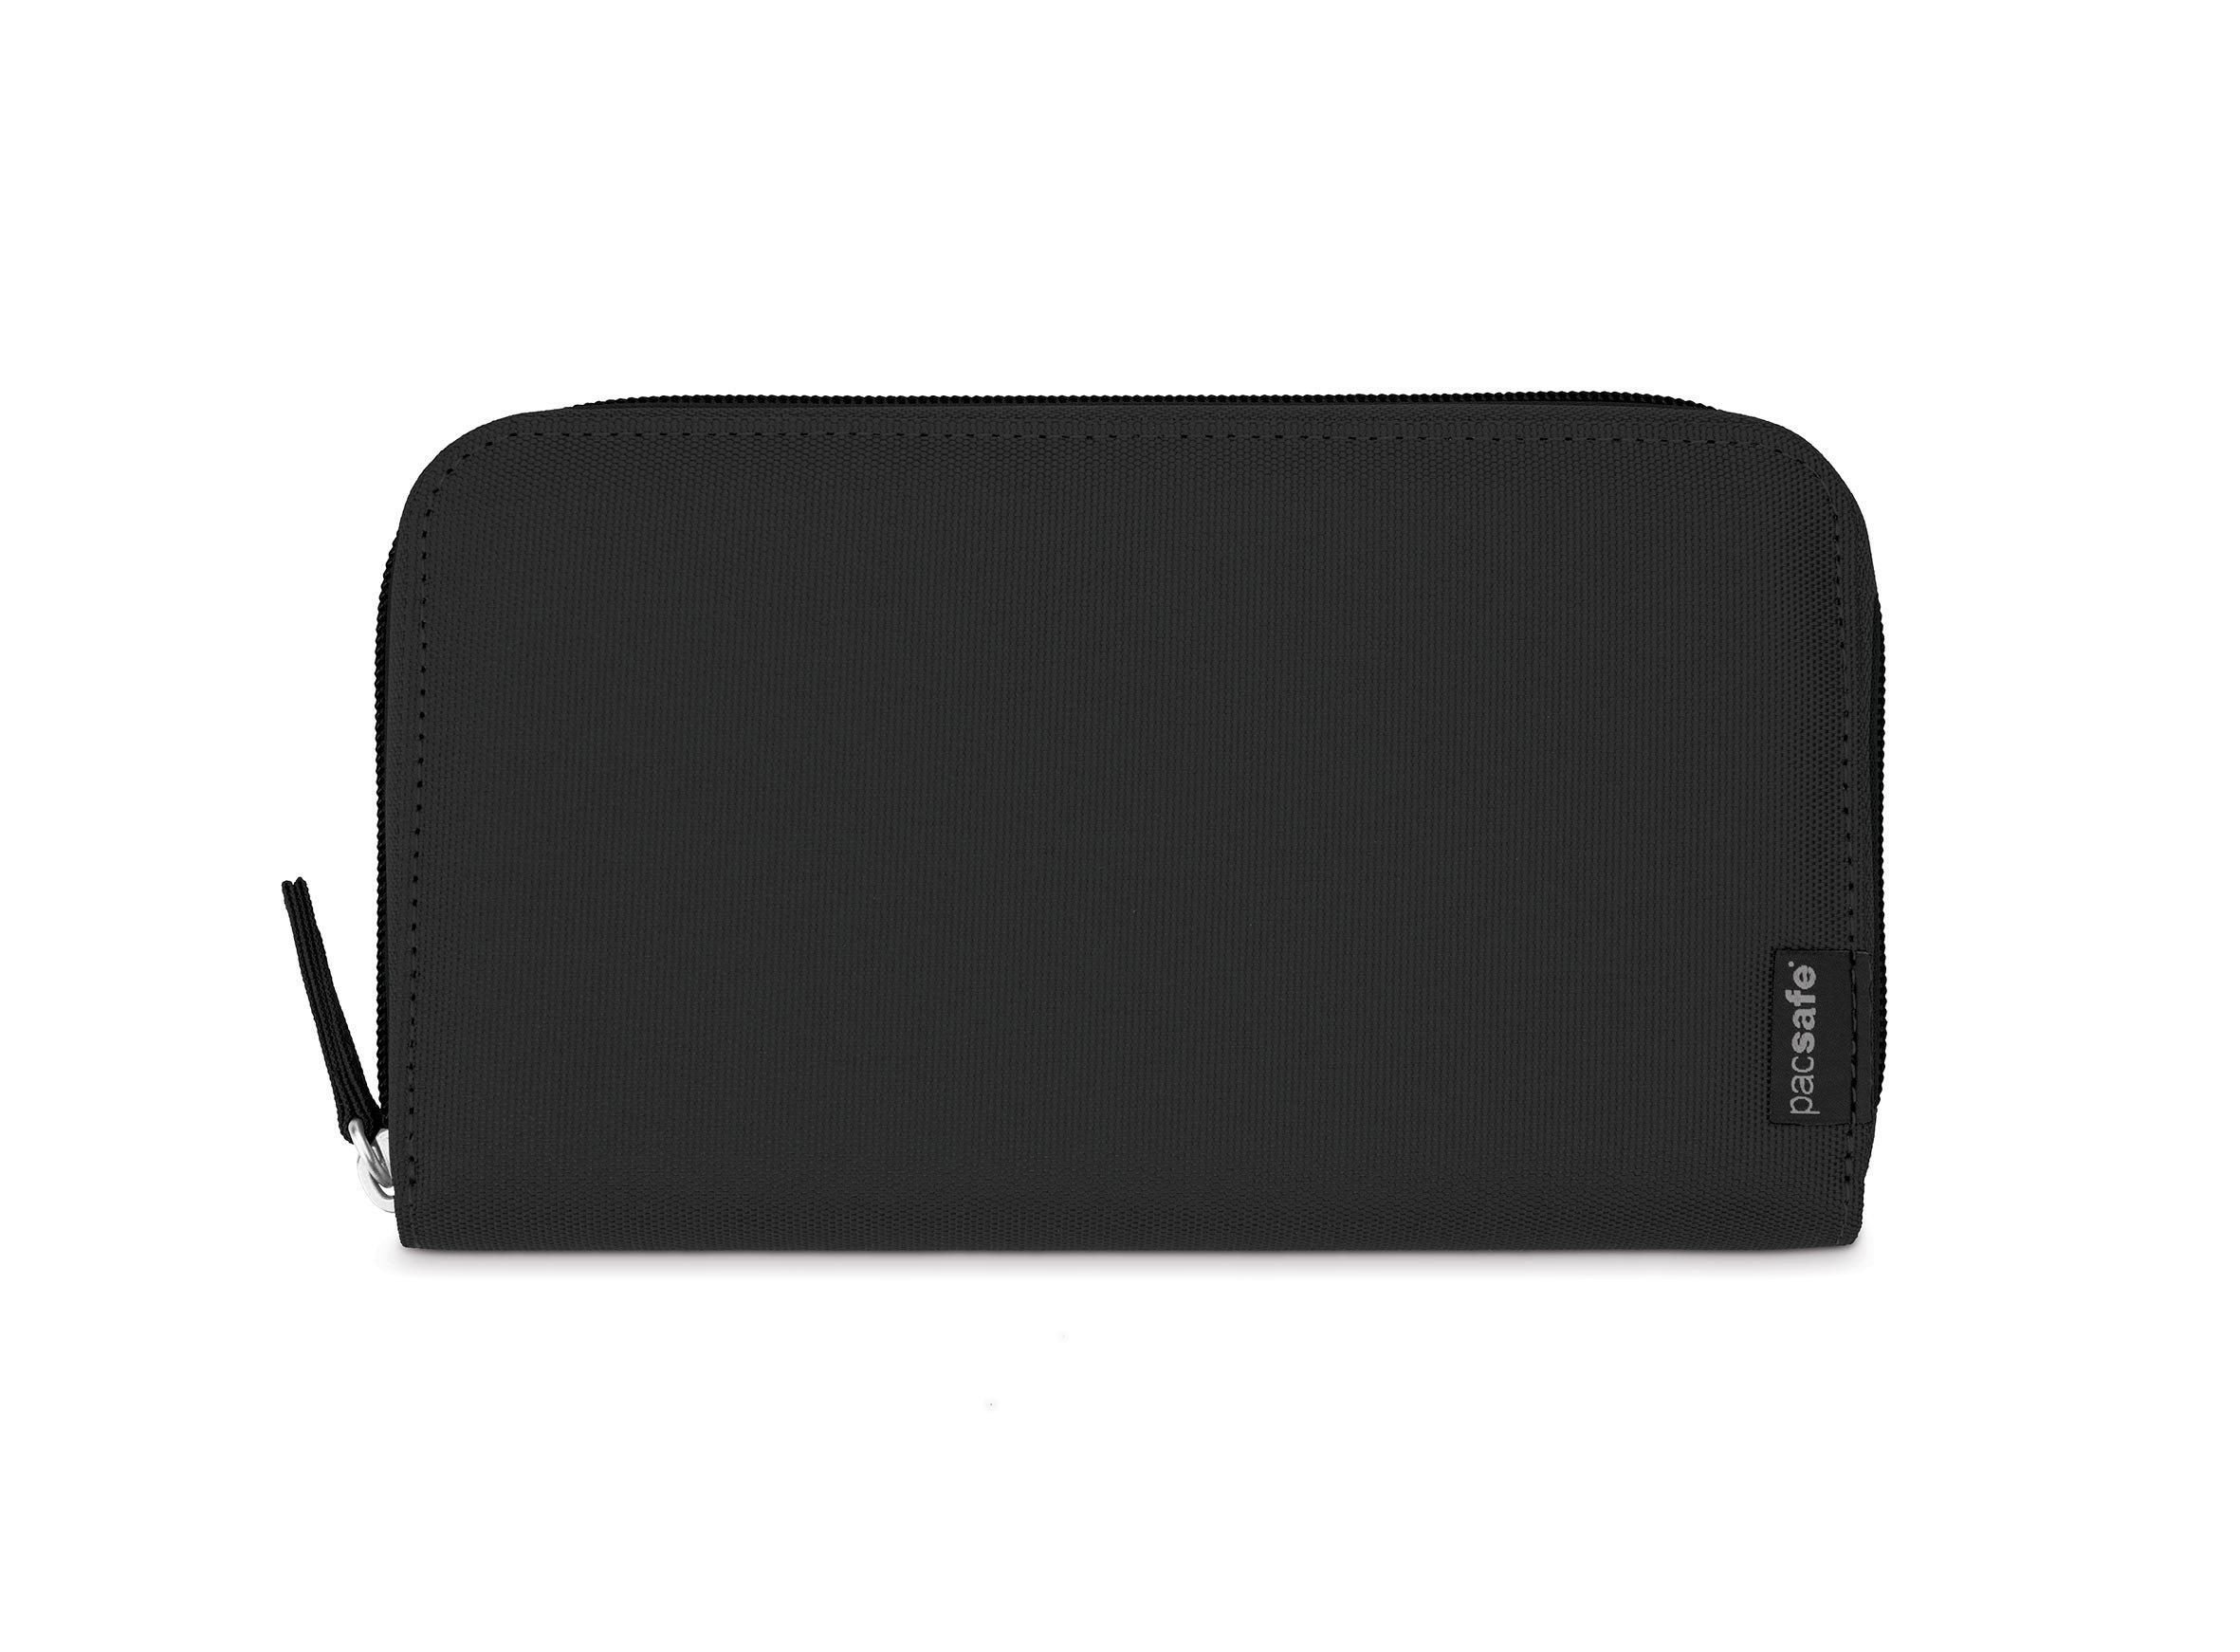 Pacsafe RFIDsafe 中性 RFIDsafe LX250 屏蔽功能钱包 10755100 黑色 均码